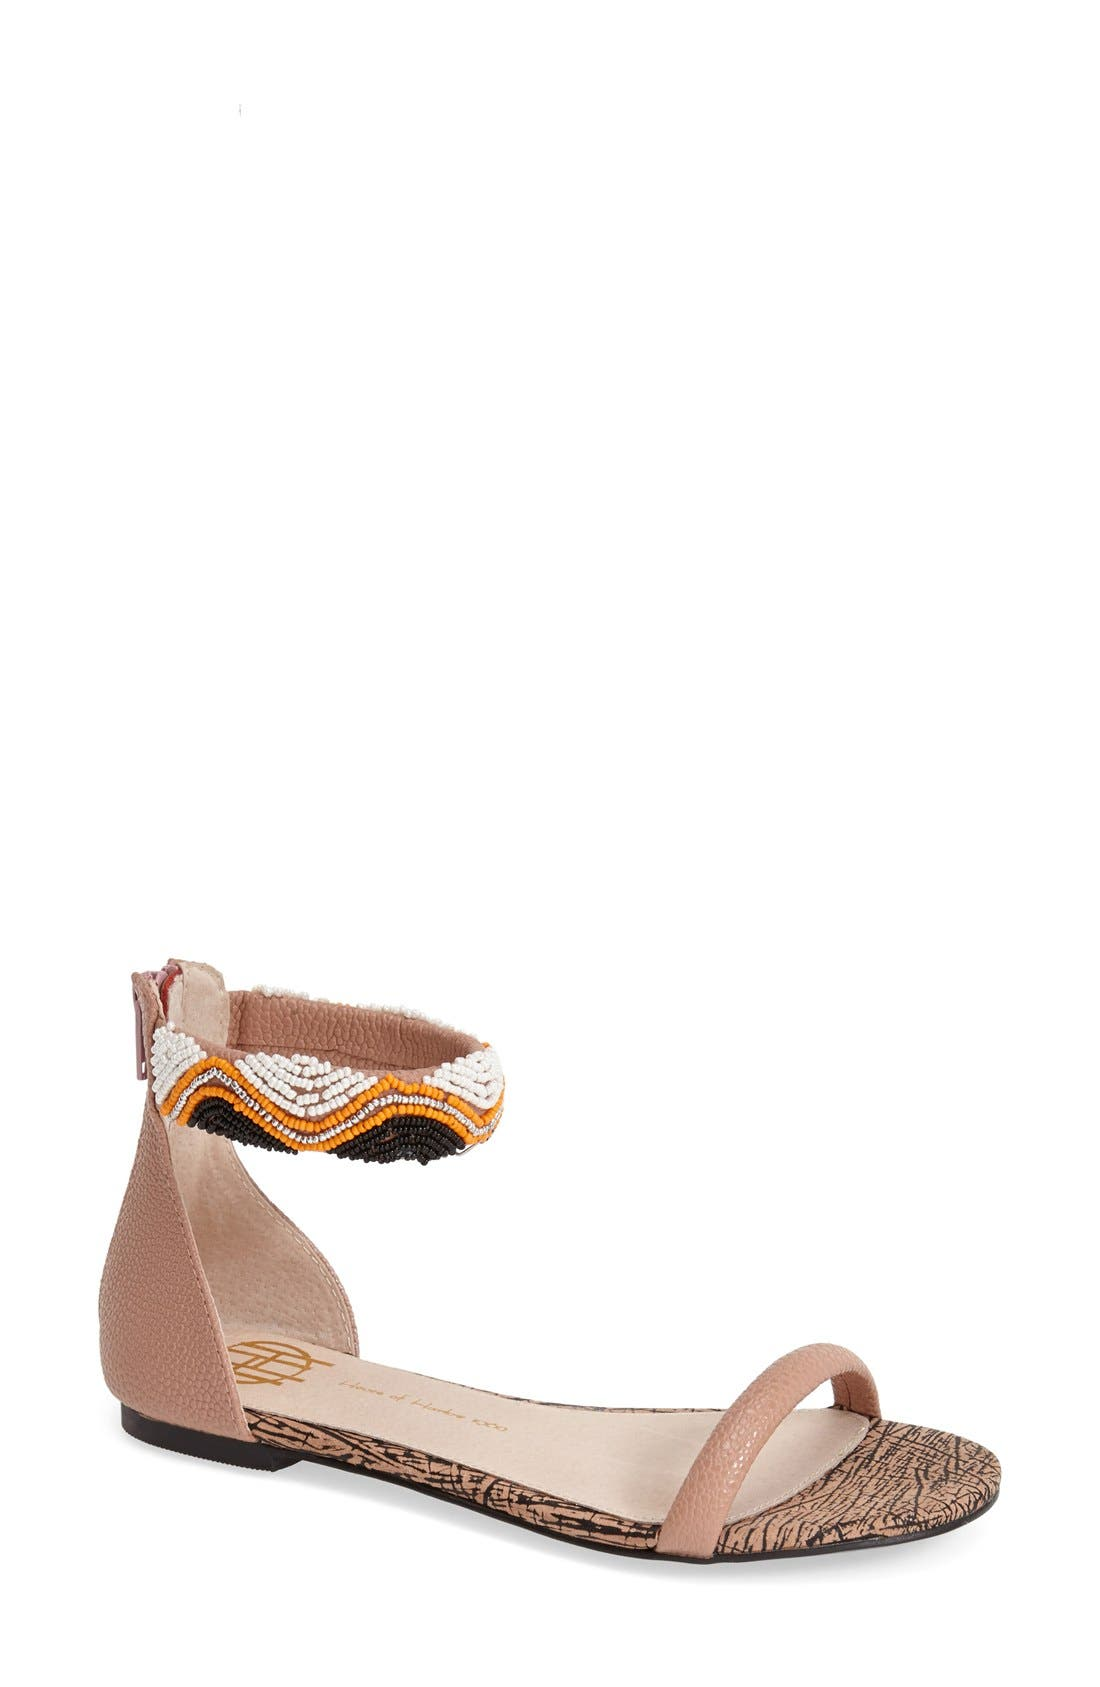 Alternate Image 1 Selected - House of Harlow 1960 Beaded Ankle Strap Sandal (Women)